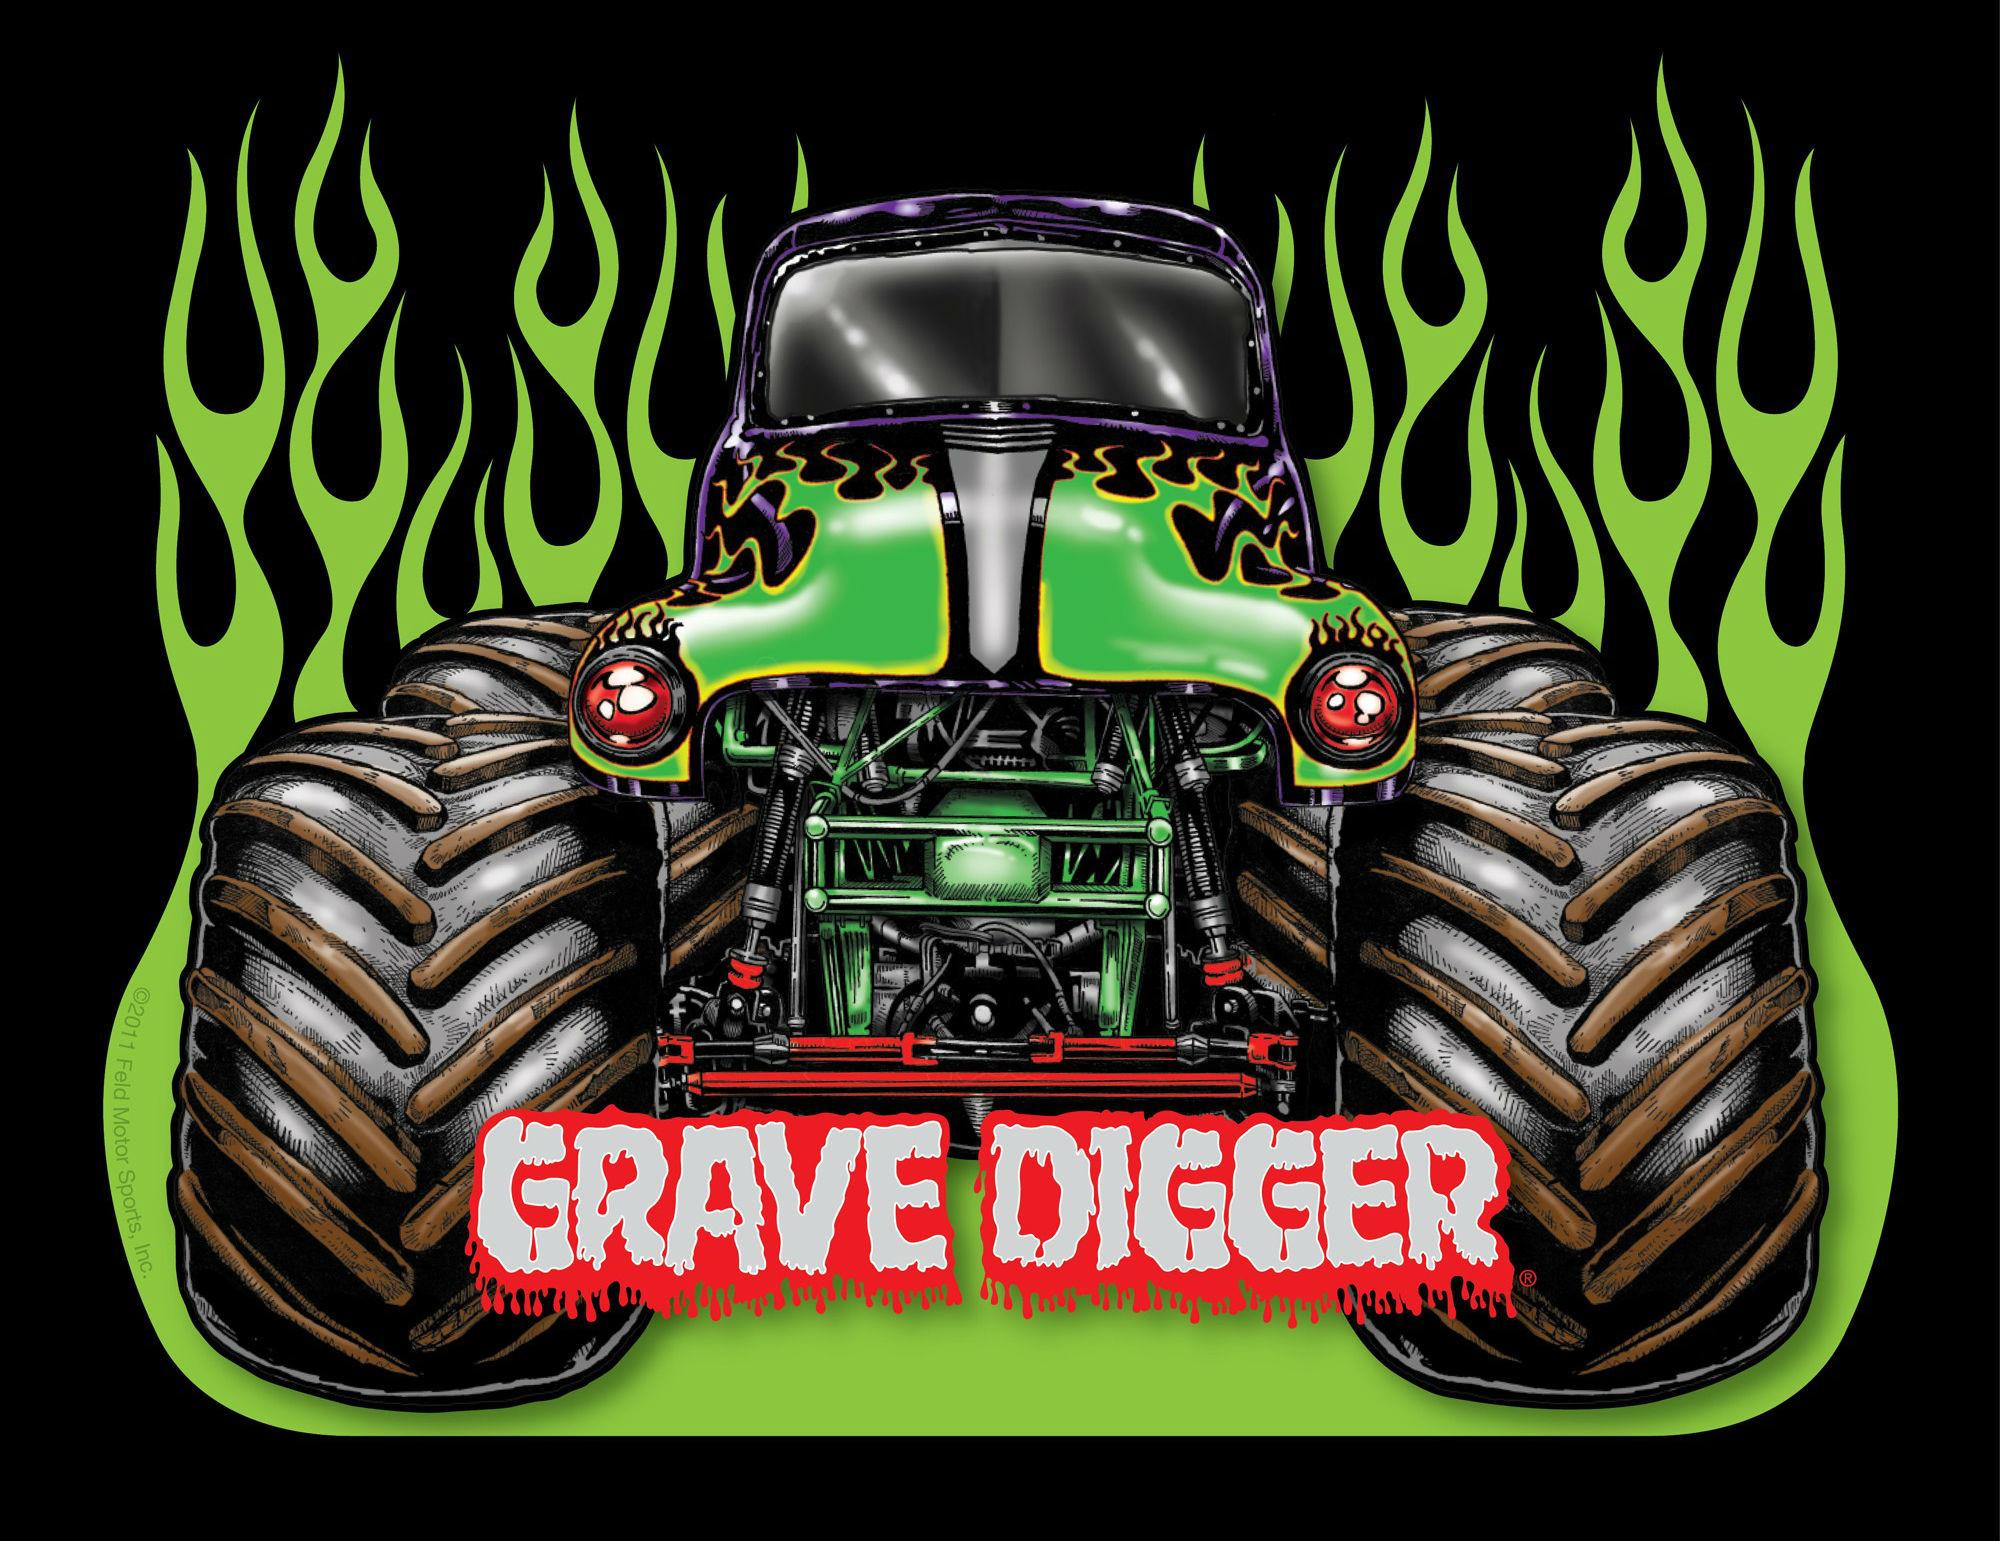 2000x1541 Monster Trucks Grave Digger Wallpaper Clipart